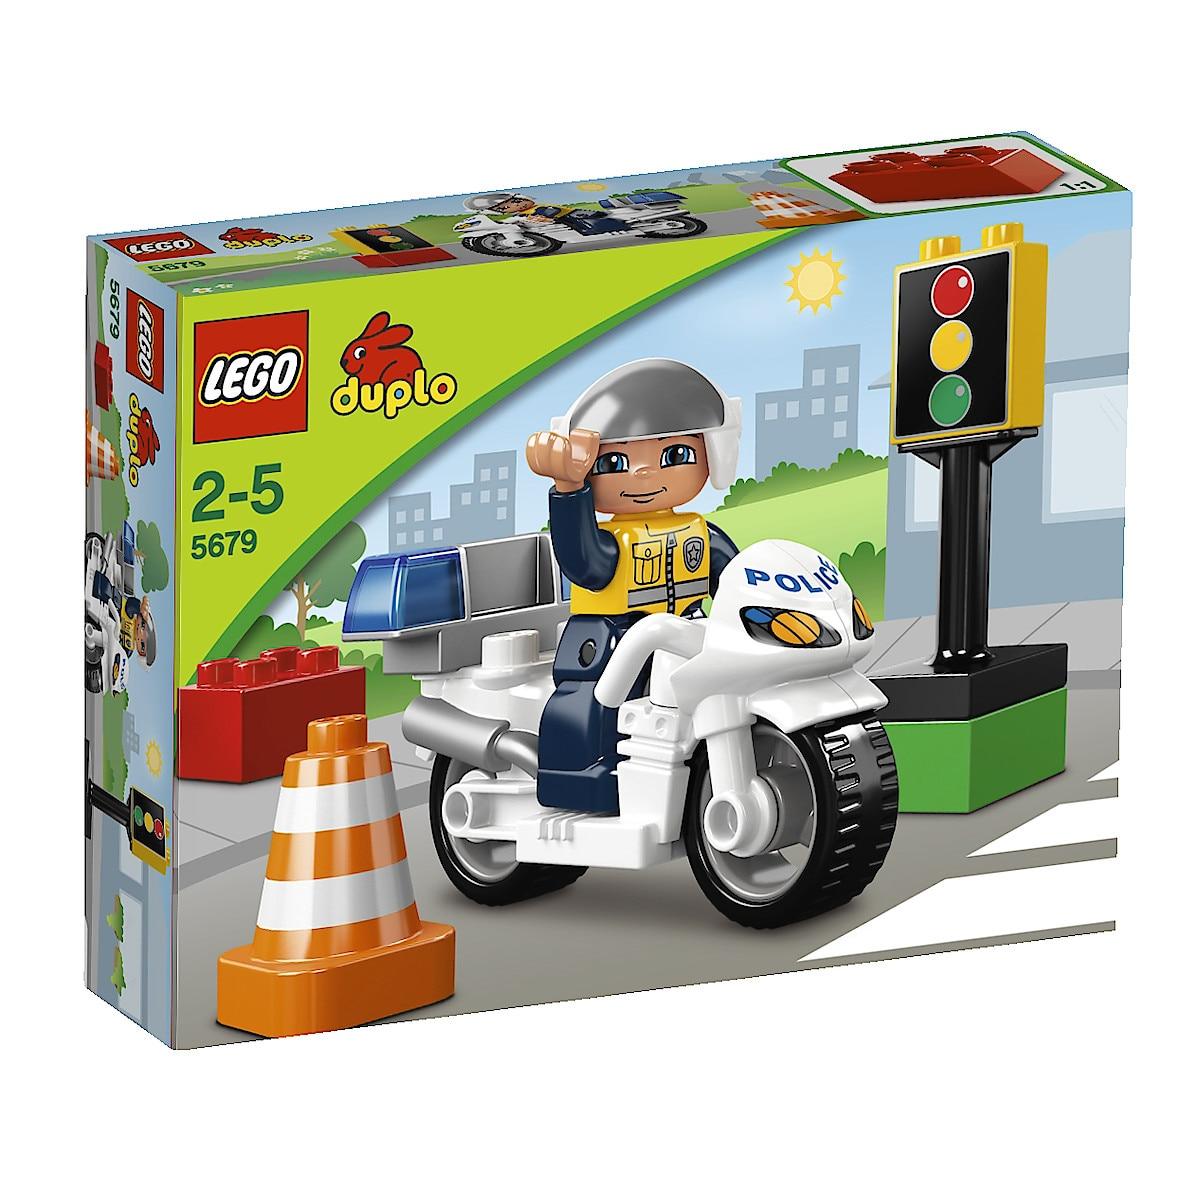 Lego Duplo small